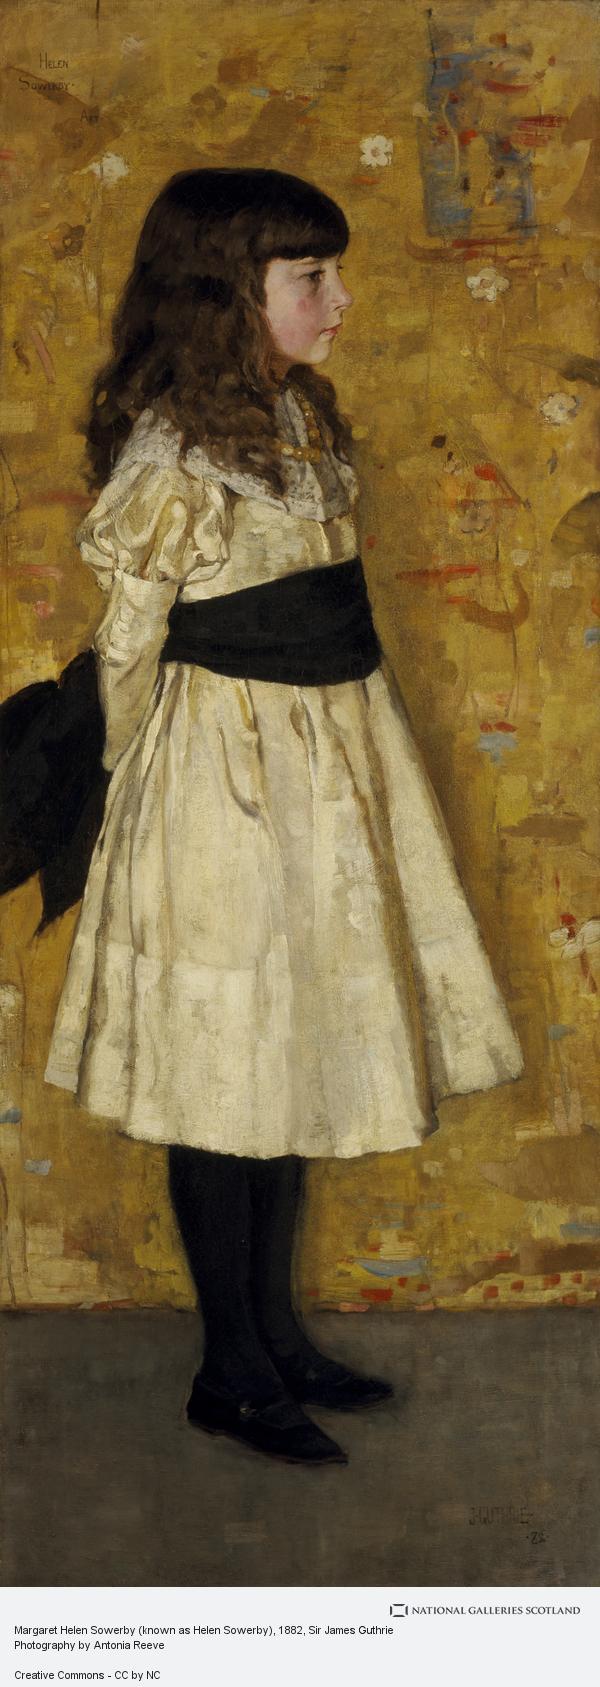 Sir James Guthrie, Margaret Helen Sowerby (known as Helen Sowerby) (1882)